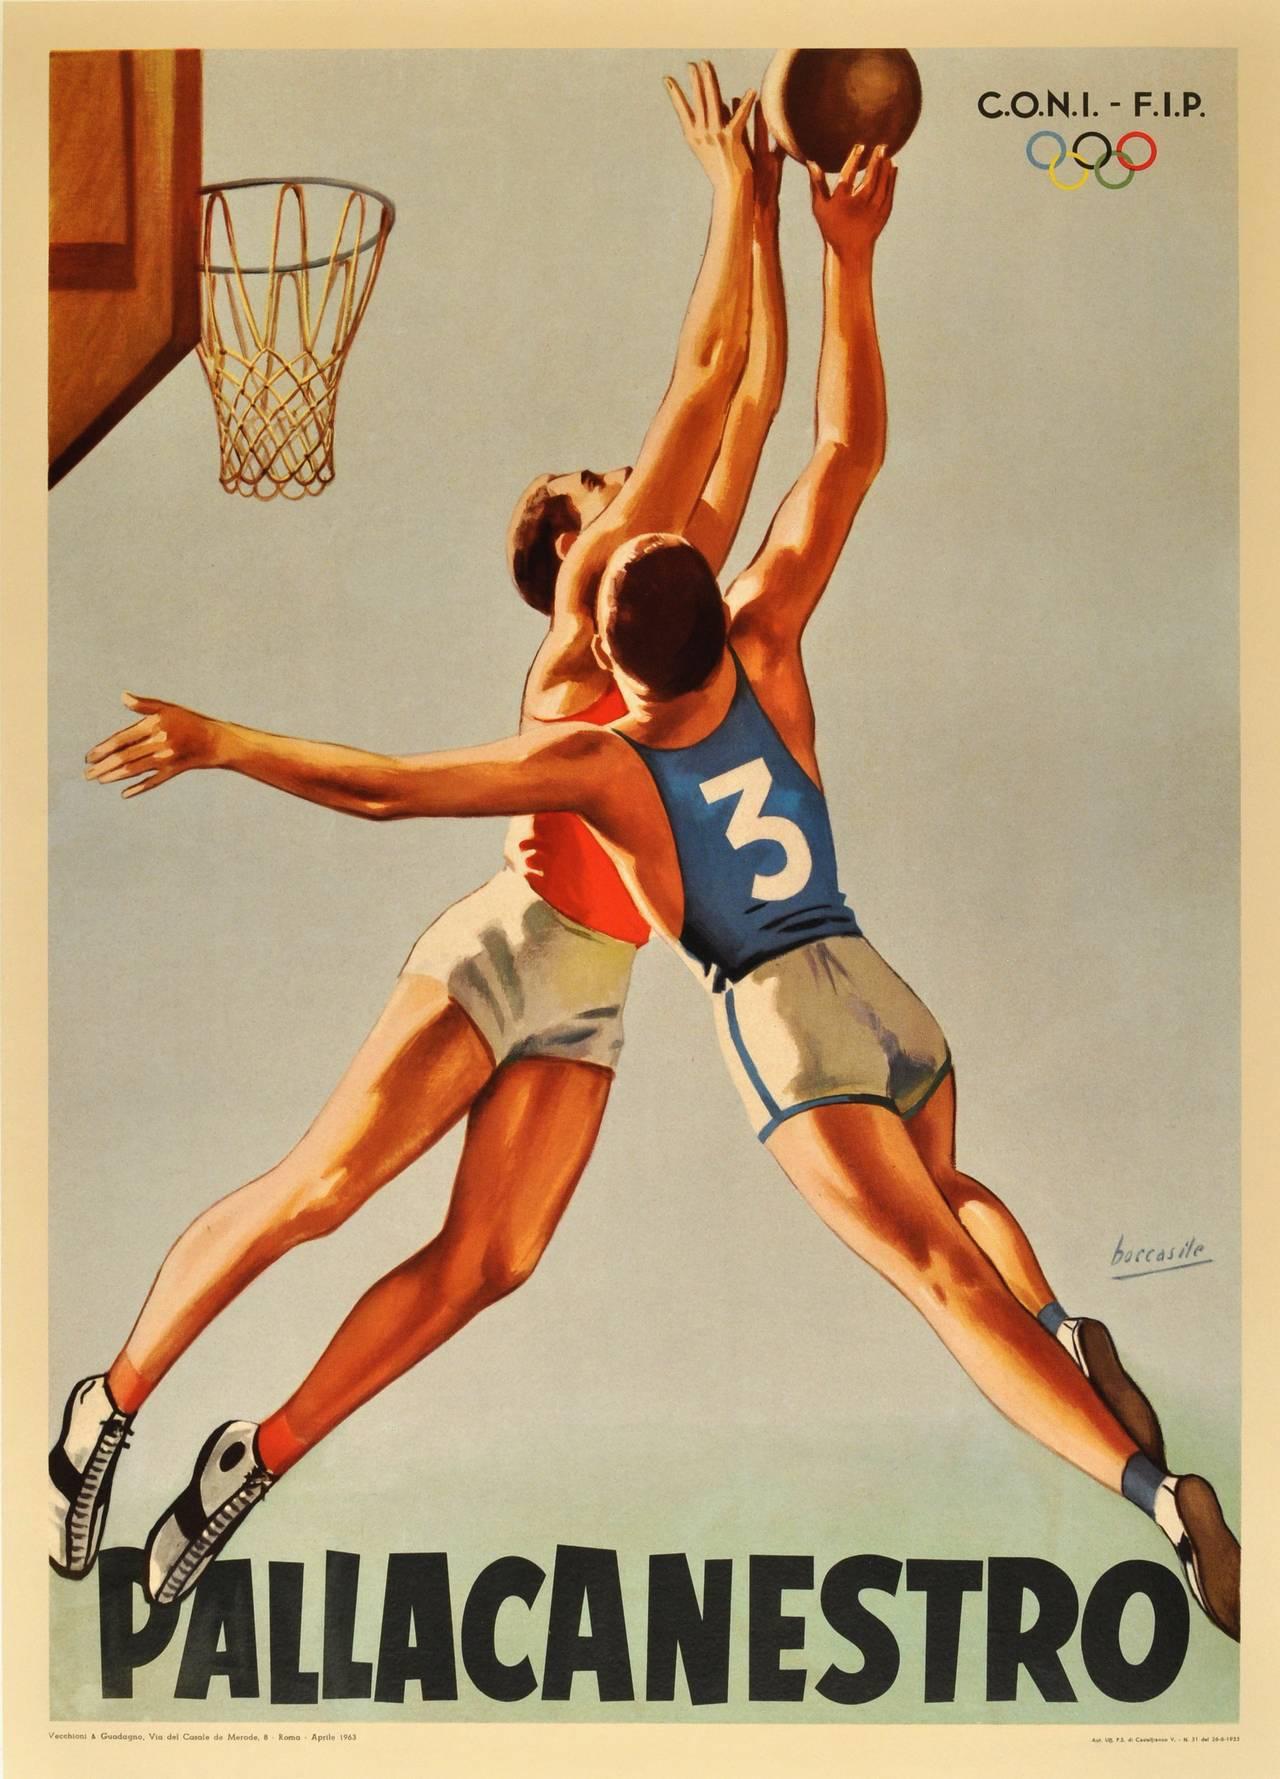 Unique Gino Boccasile - Original Vintage 1963 Sport Poster: Pallacanestro  PW67